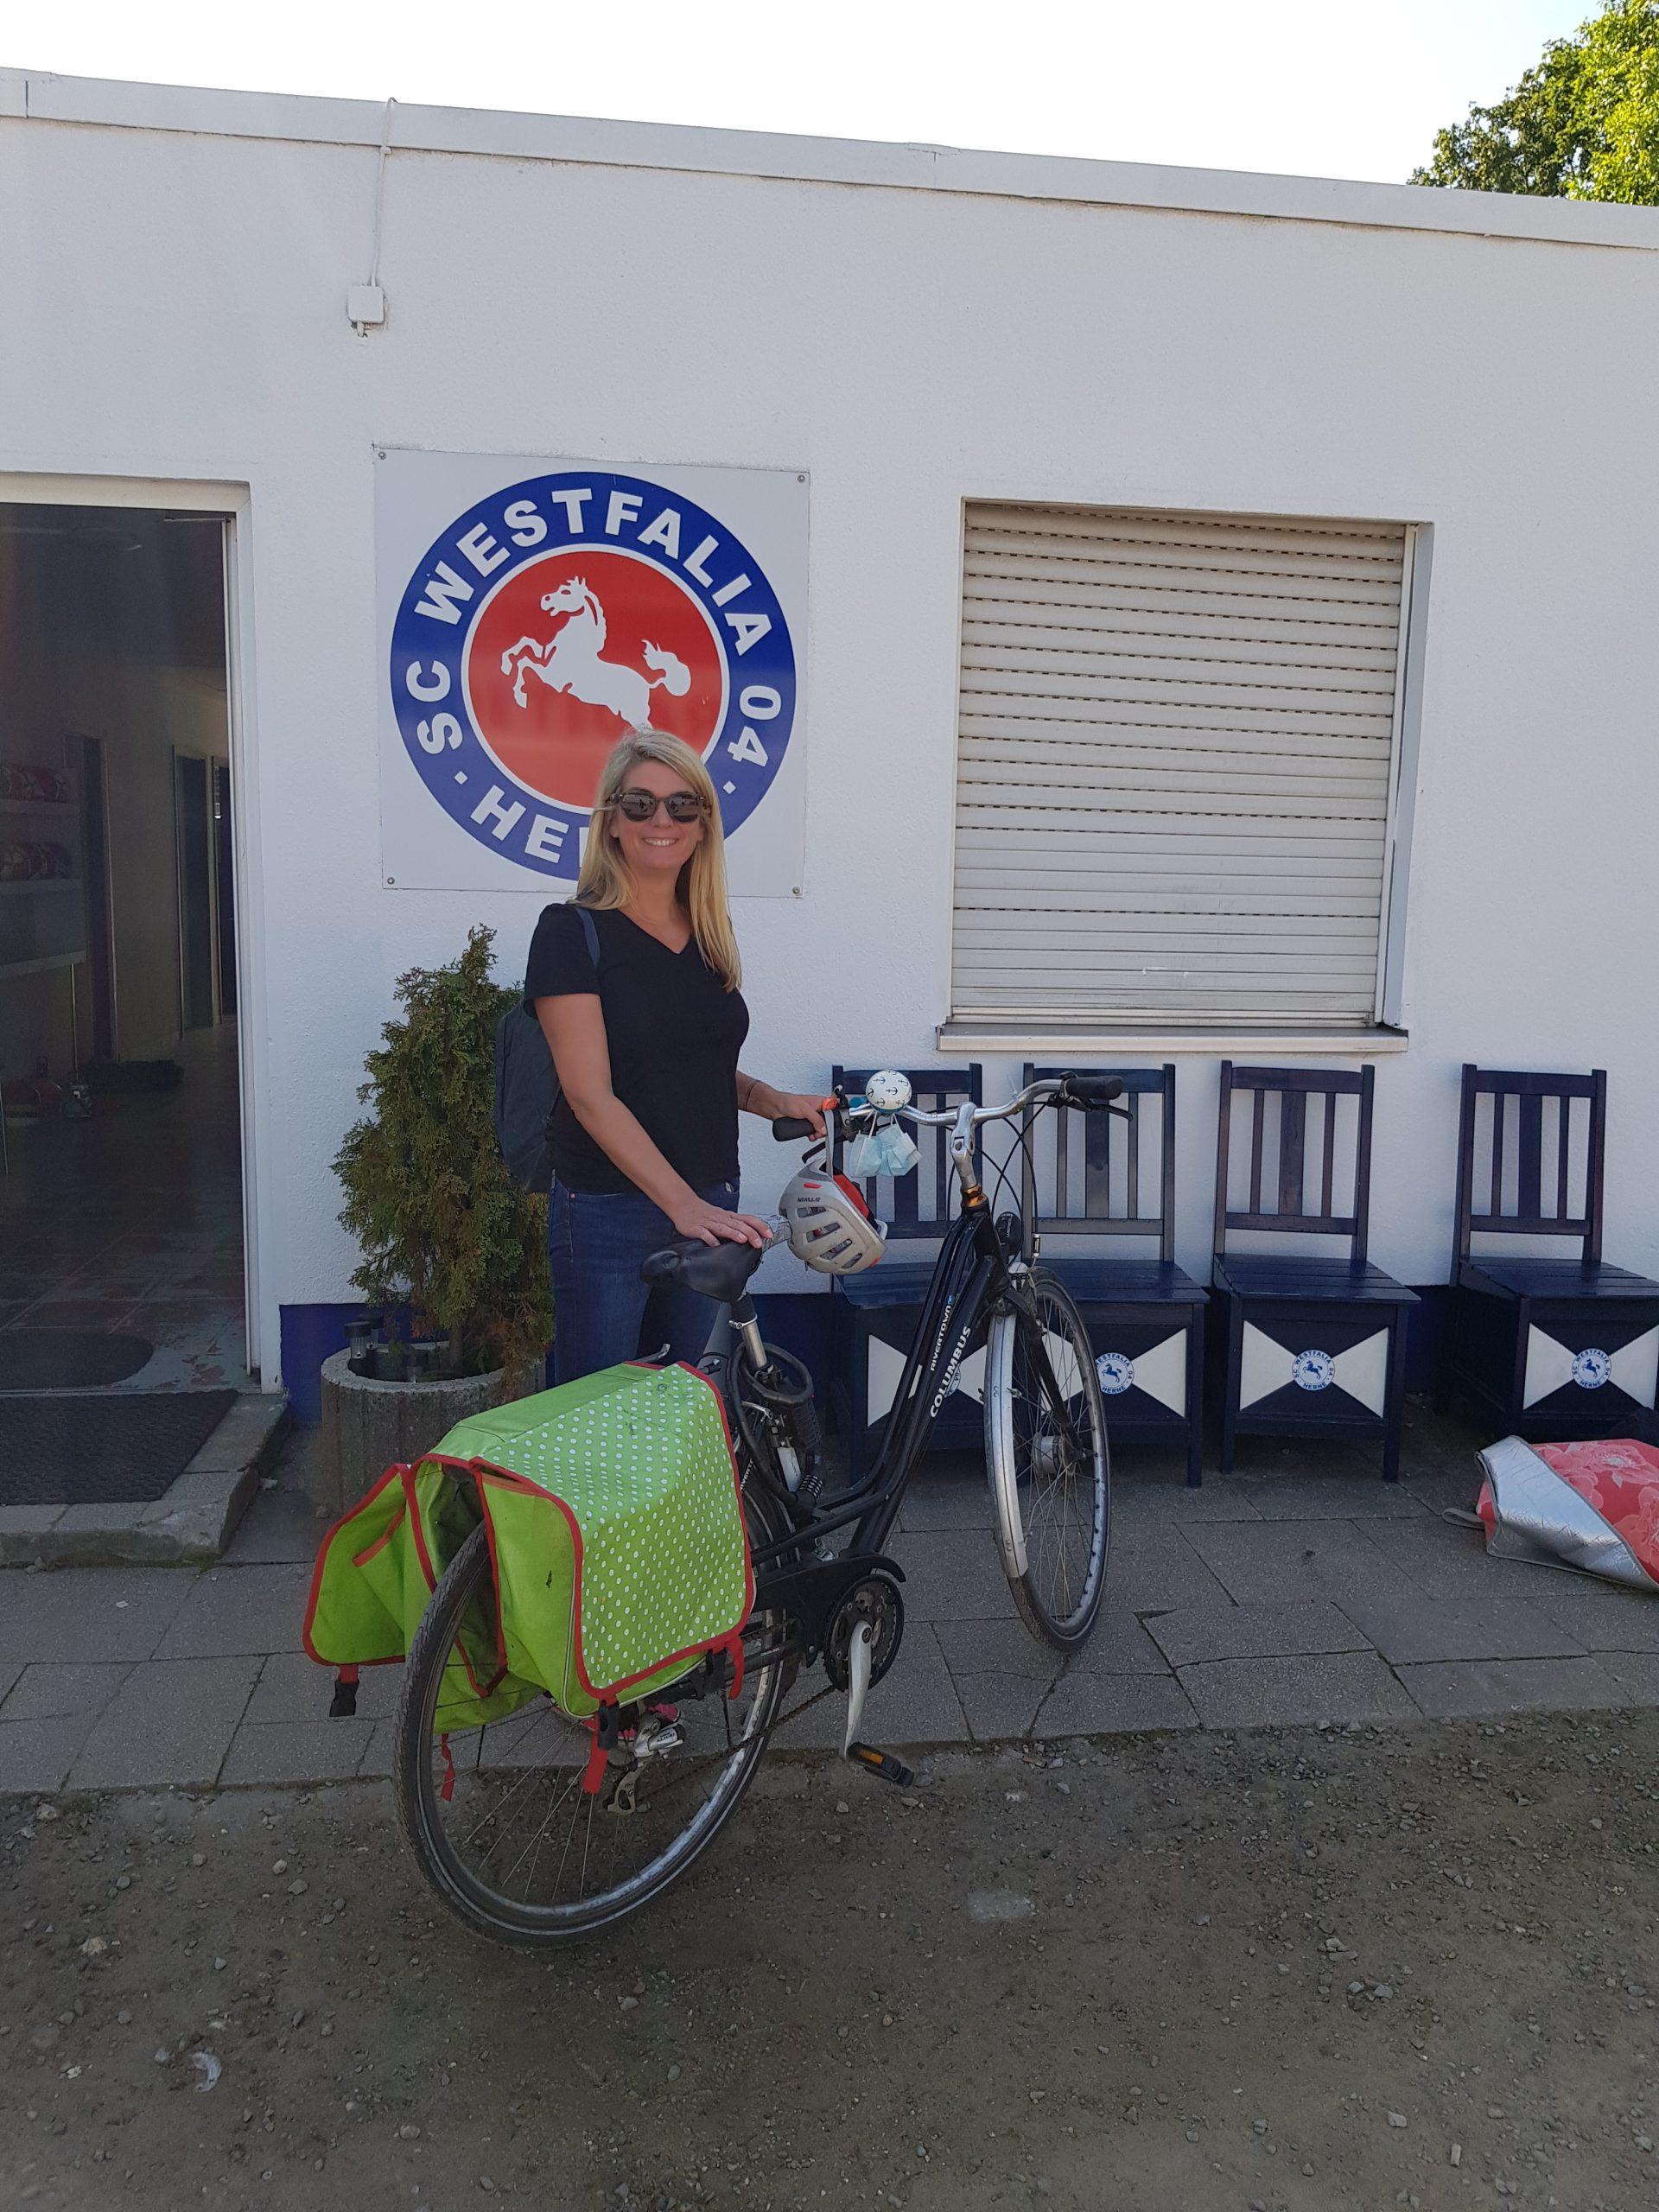 Per Rad zu Westfalia Herne